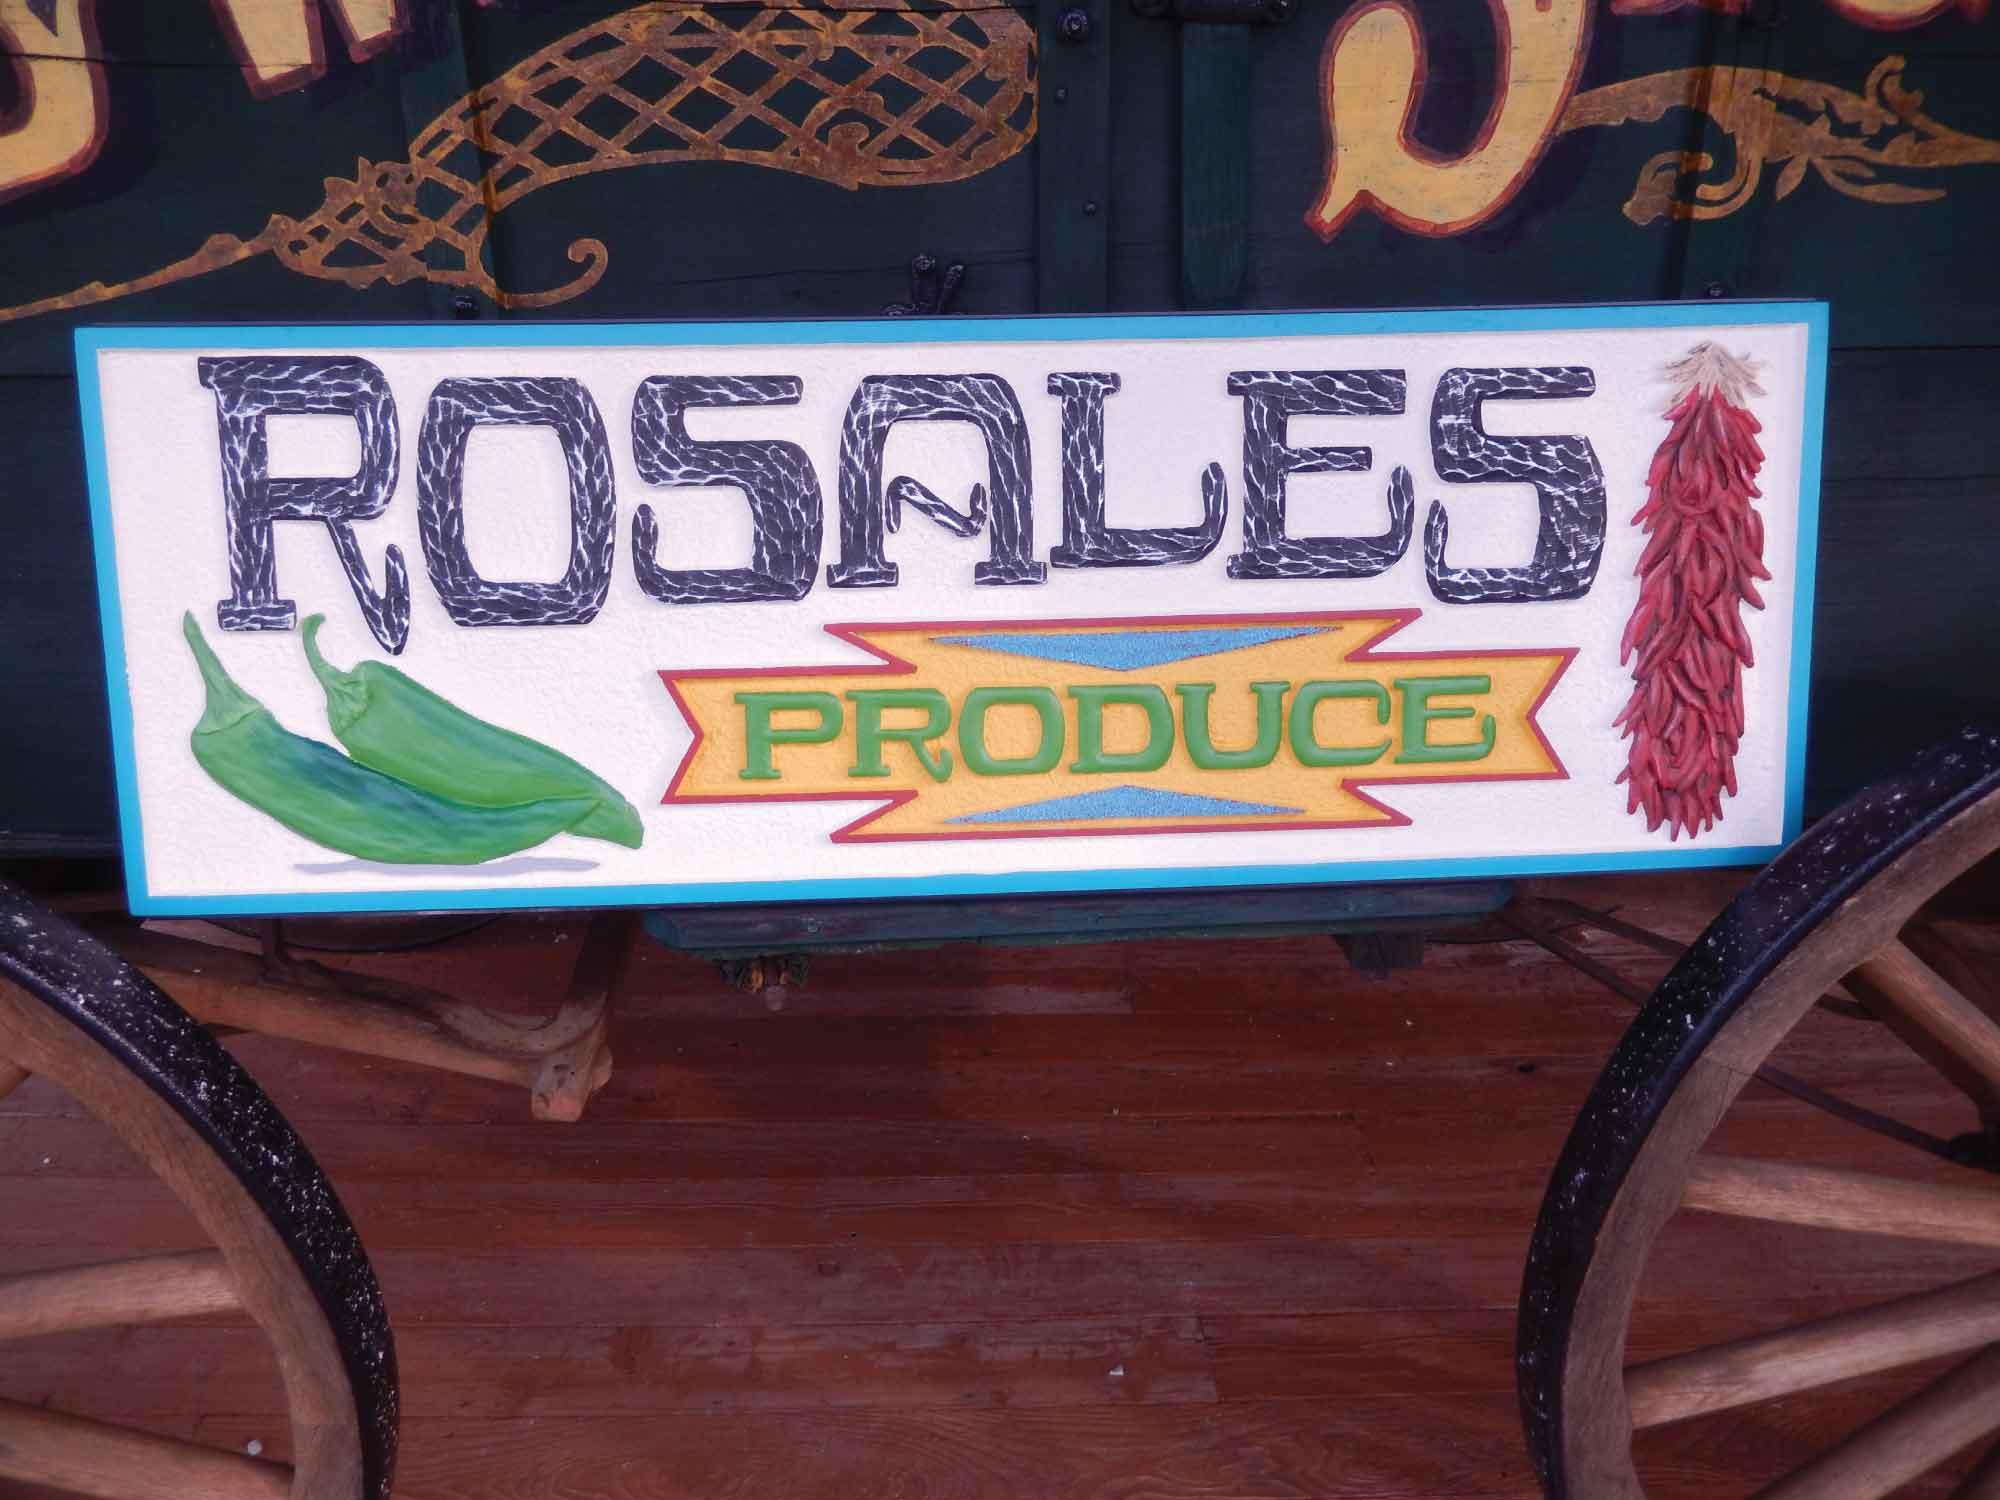 Rosales Produce